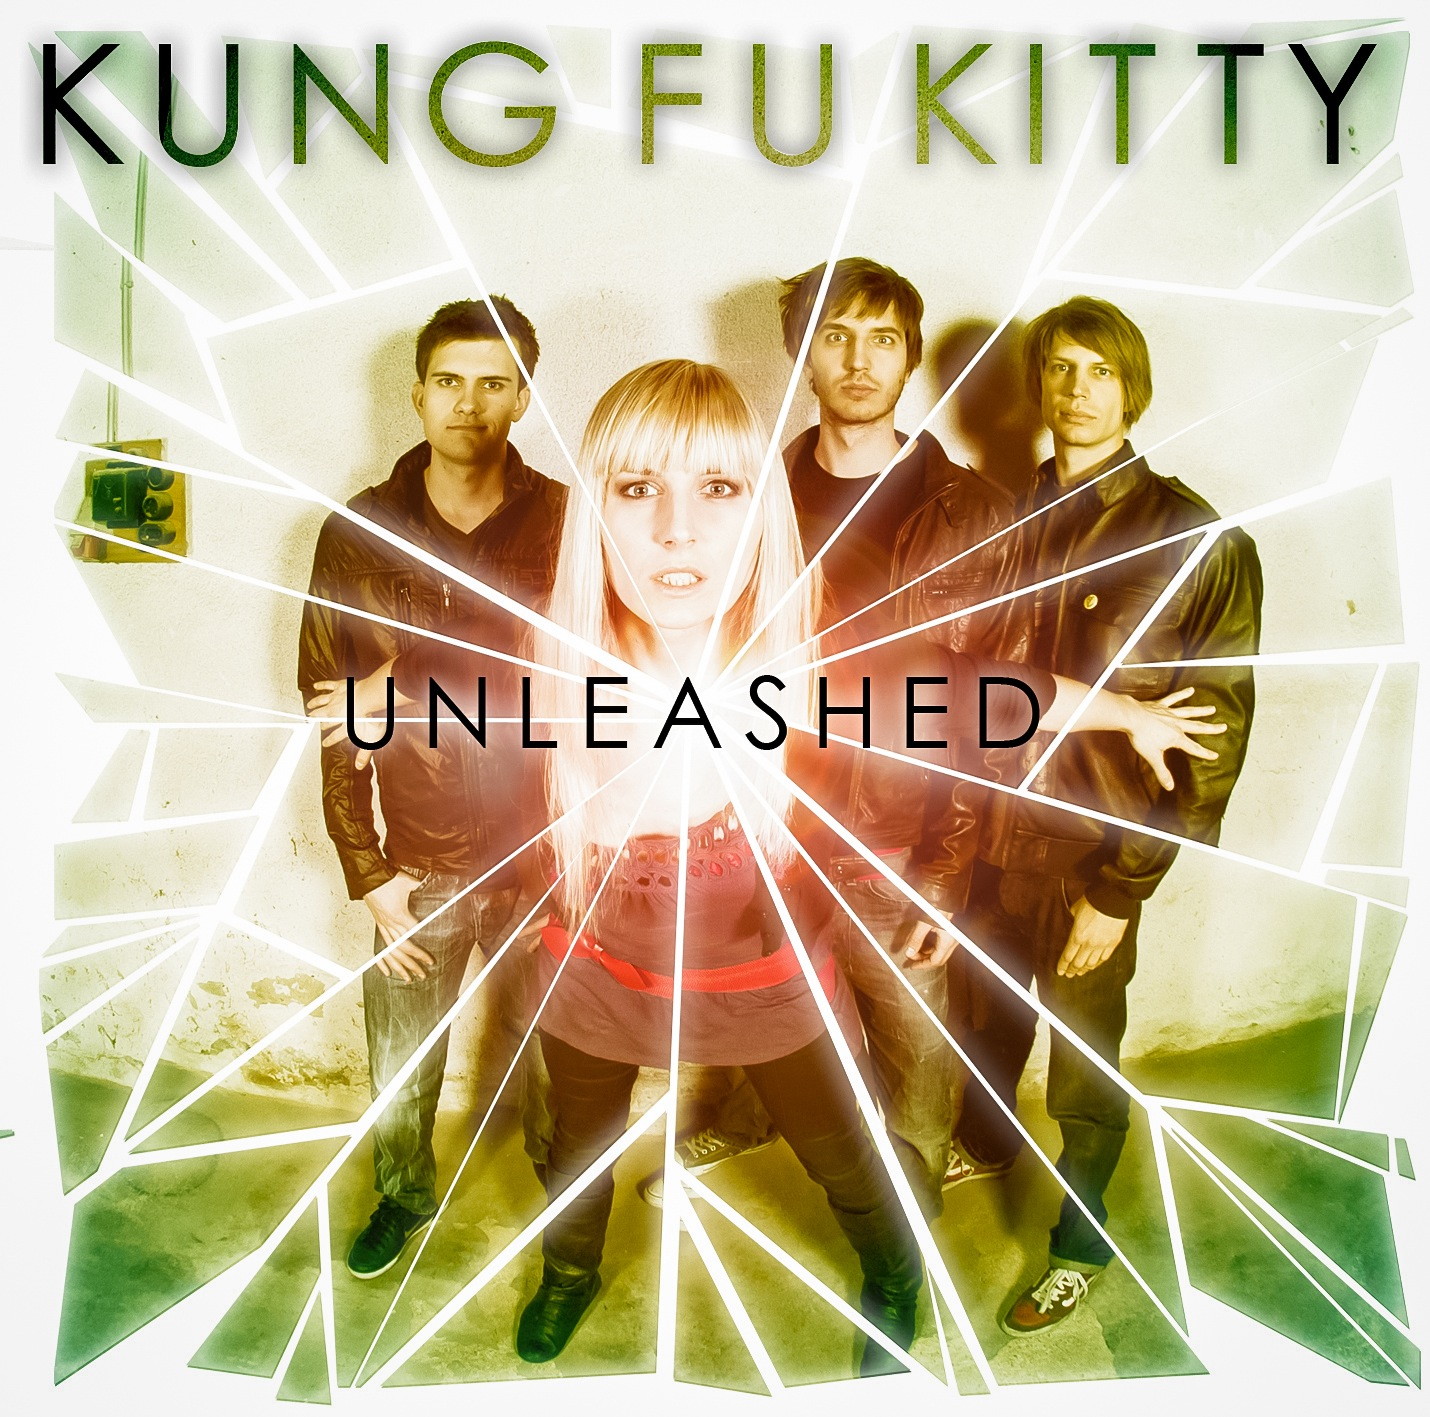 Kung Fu Kitty - Unleashed